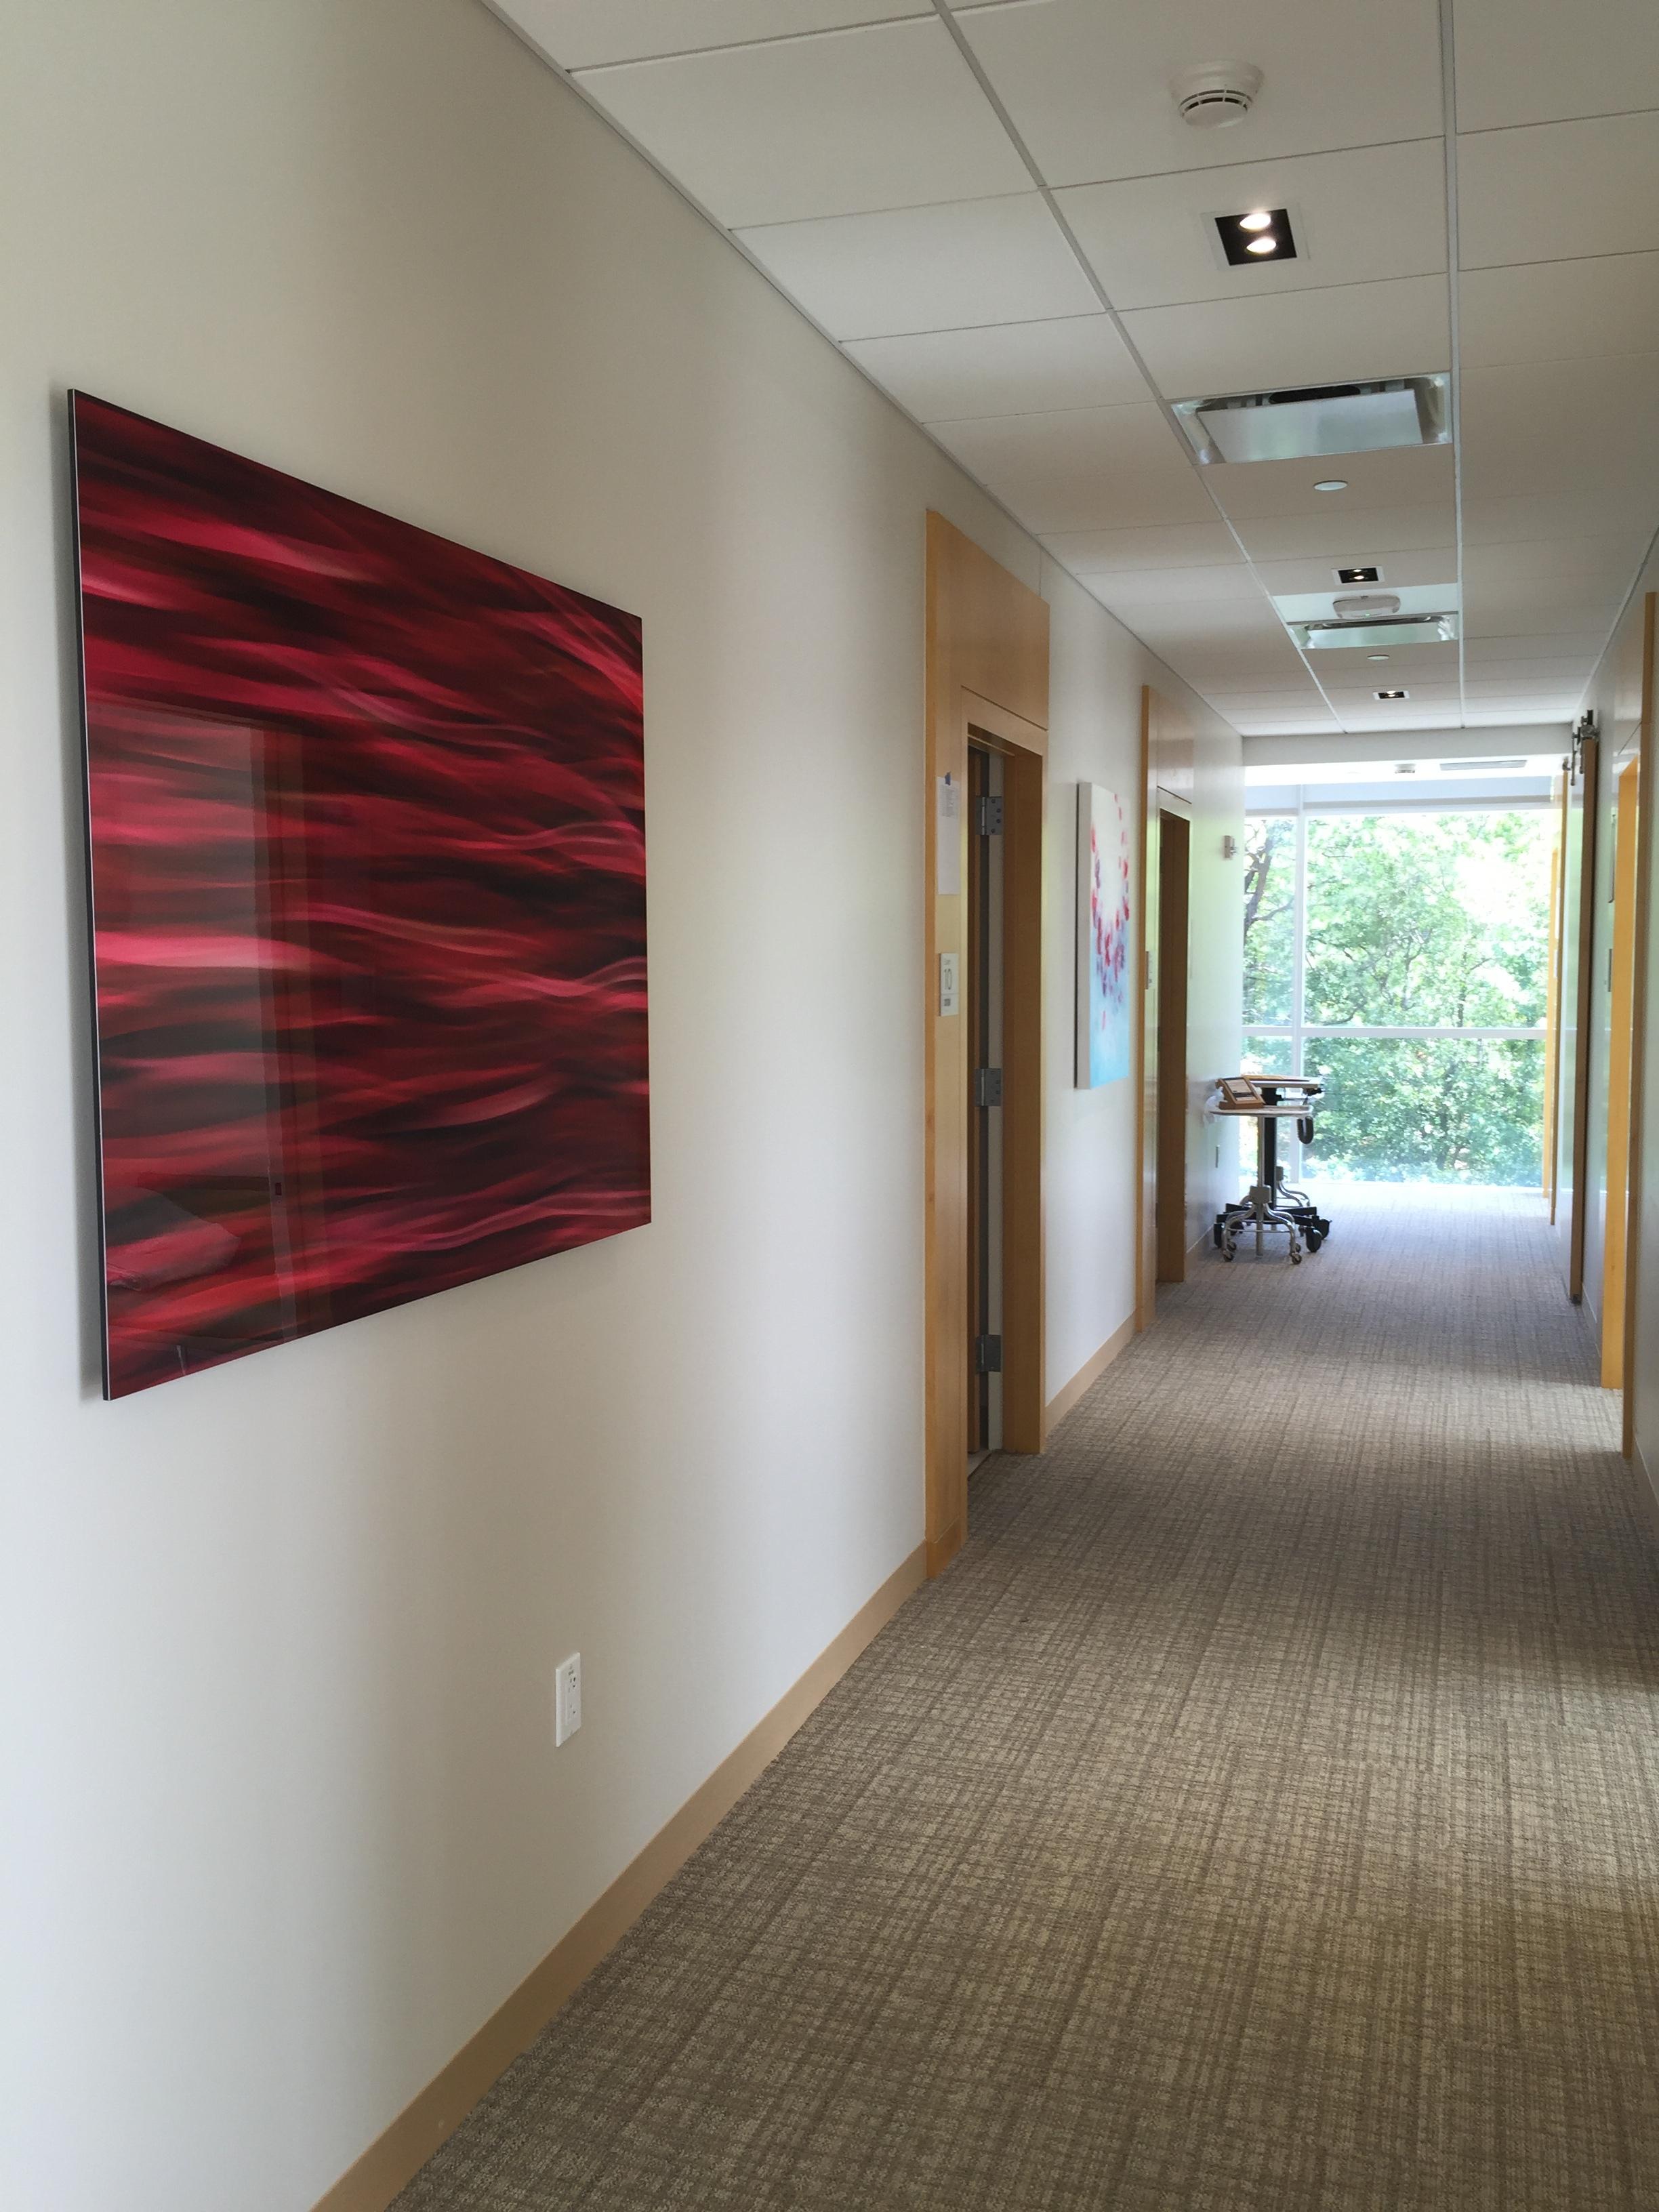 Sloan Kettering Memorial Hospital, NY